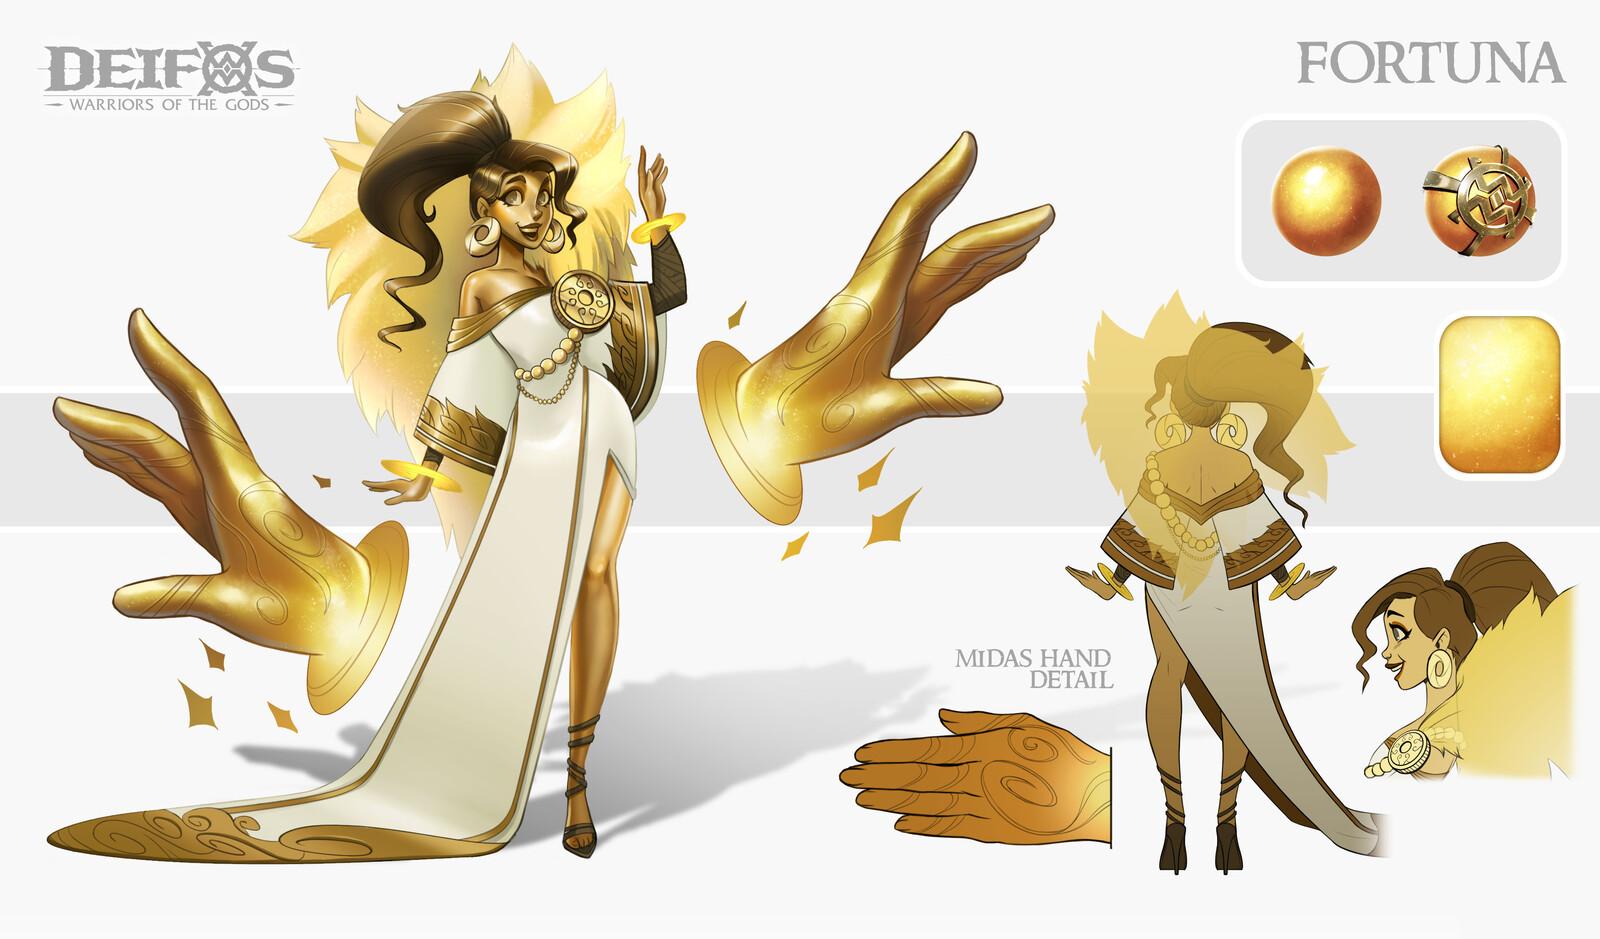 Fortuna, Goddess of Fortune